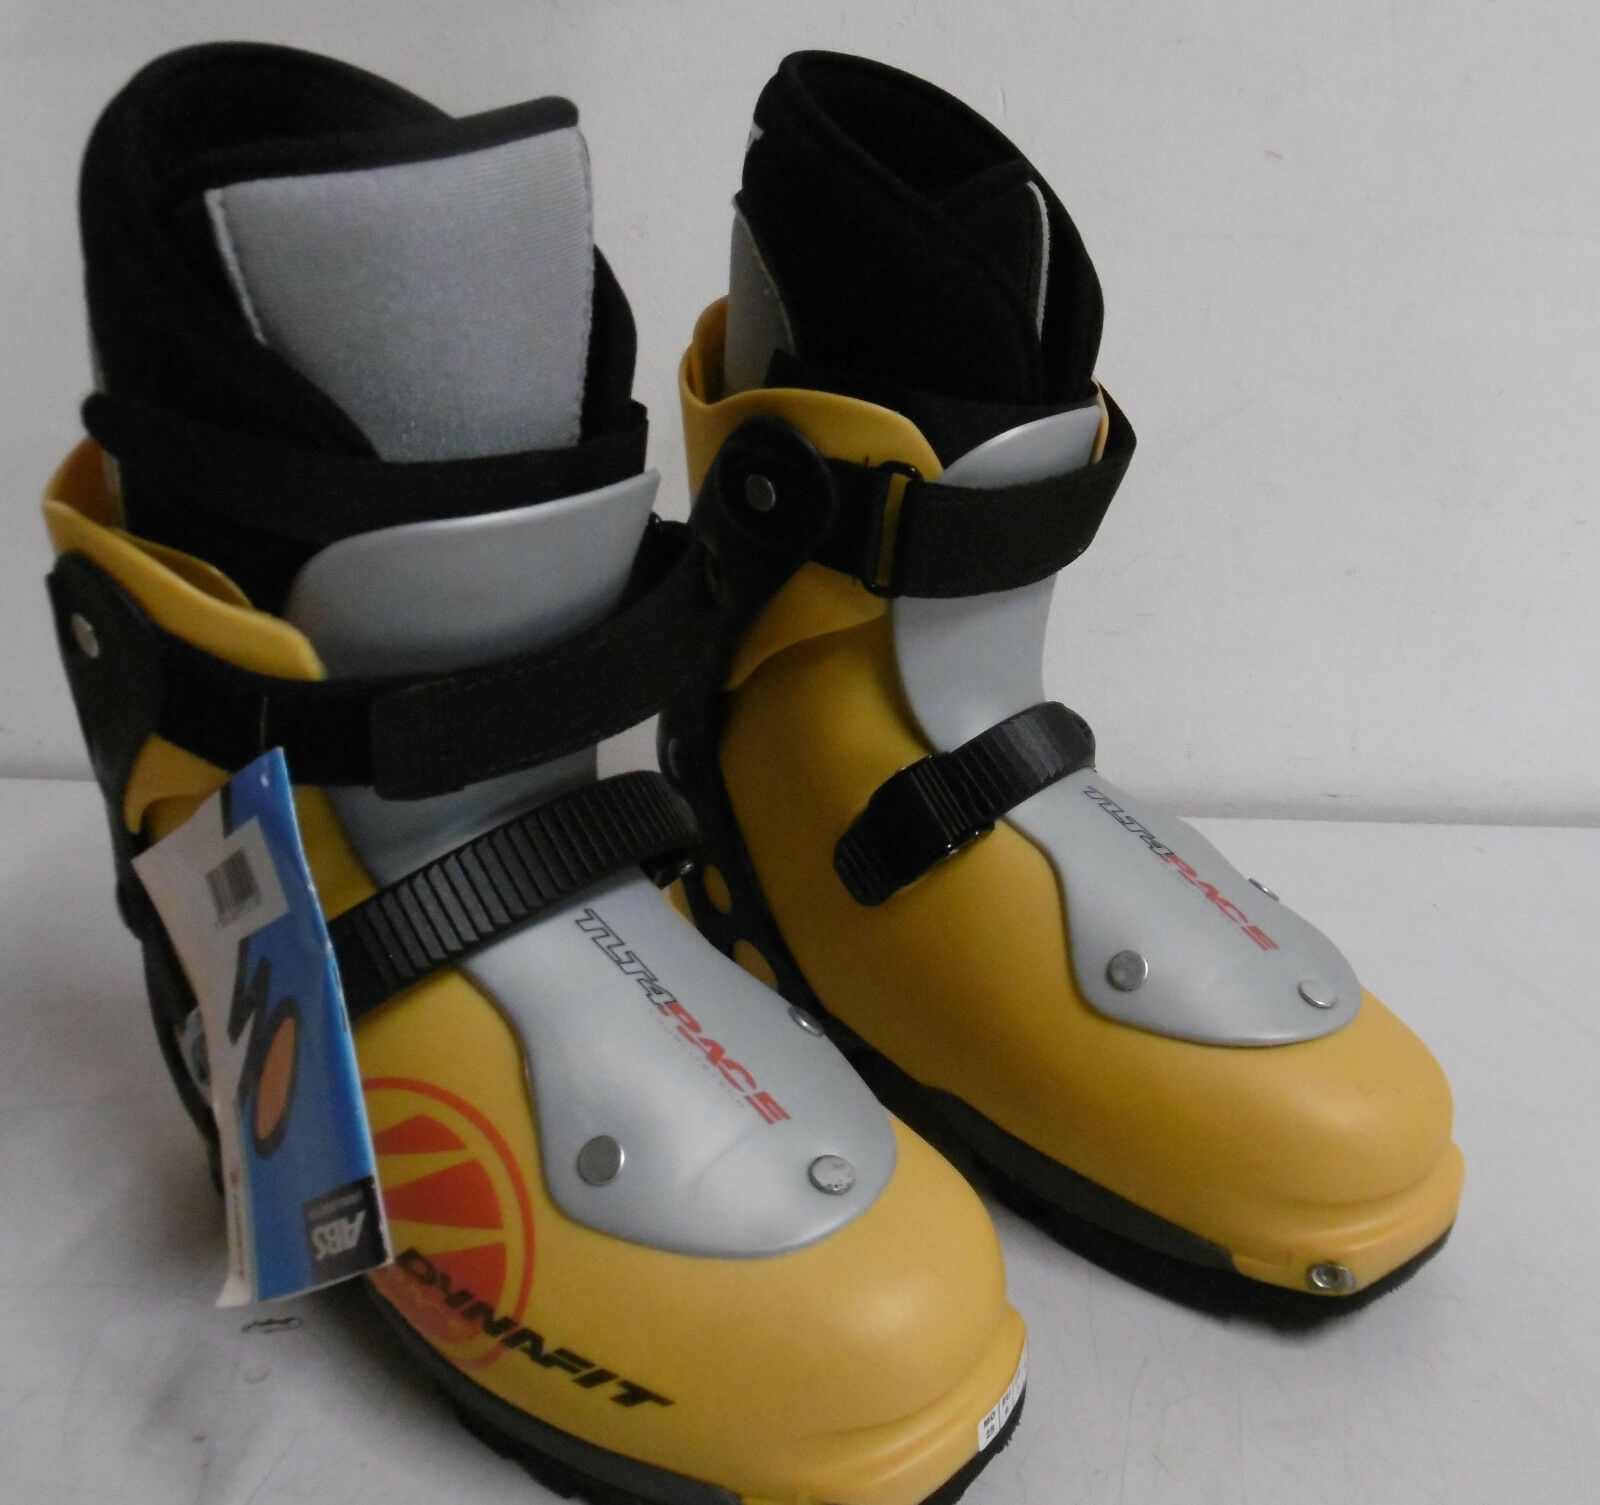 Dynafit TLT 4 Race Skitourenschuh 25.0 Skischuh Tourenschuh Free-Ride gelb grau